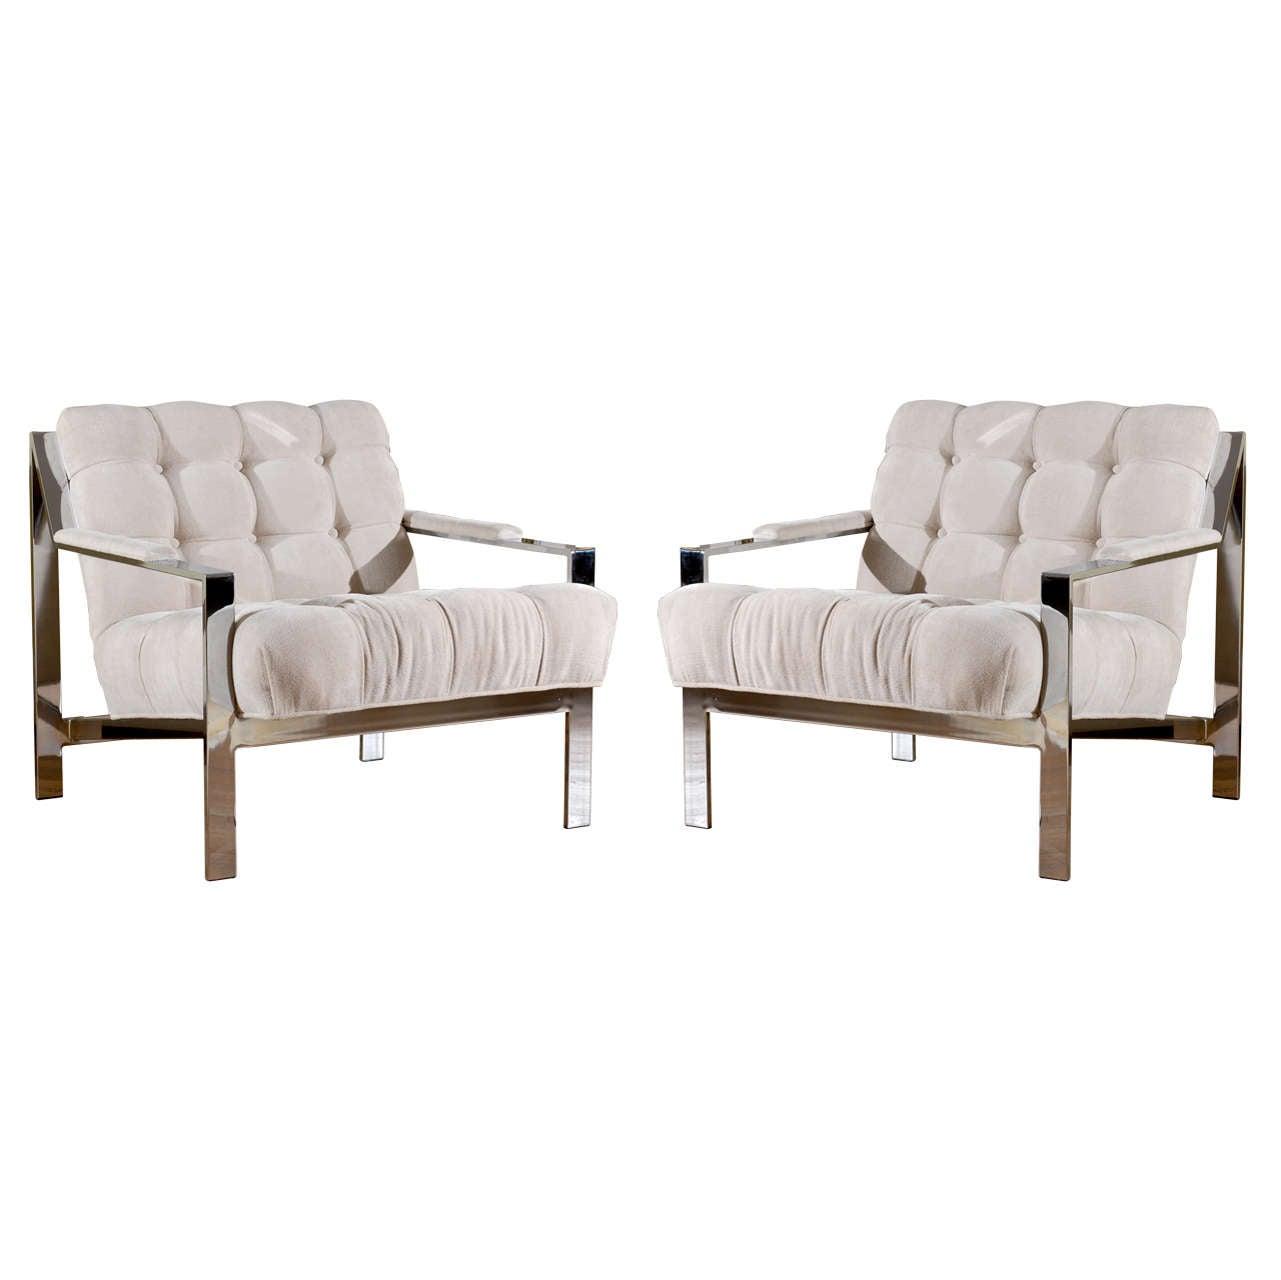 Restored Pair of Cy Mann Lounge Chairs in Cut Linen Velvet